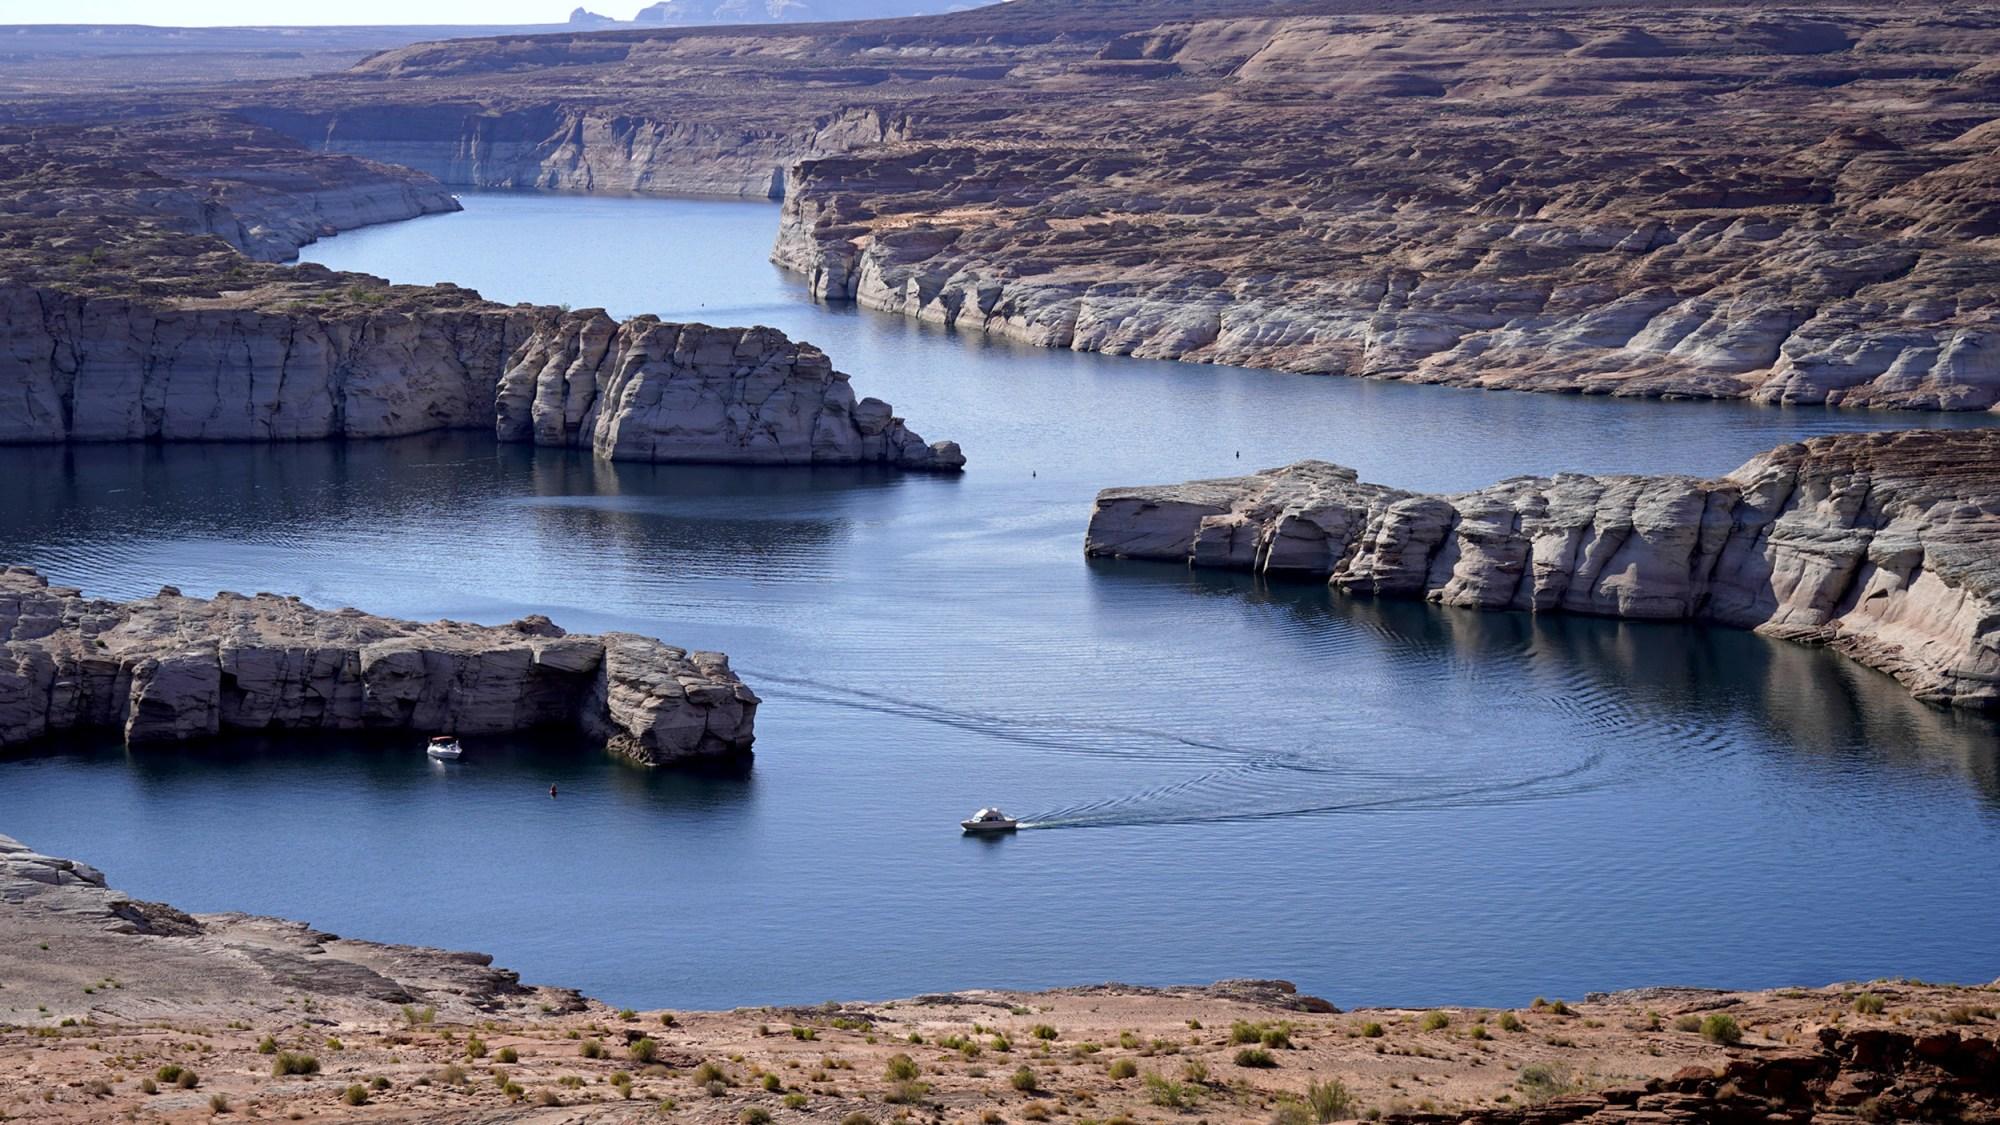 Arizona's Lake Powell Water Level Falls to Historic Low